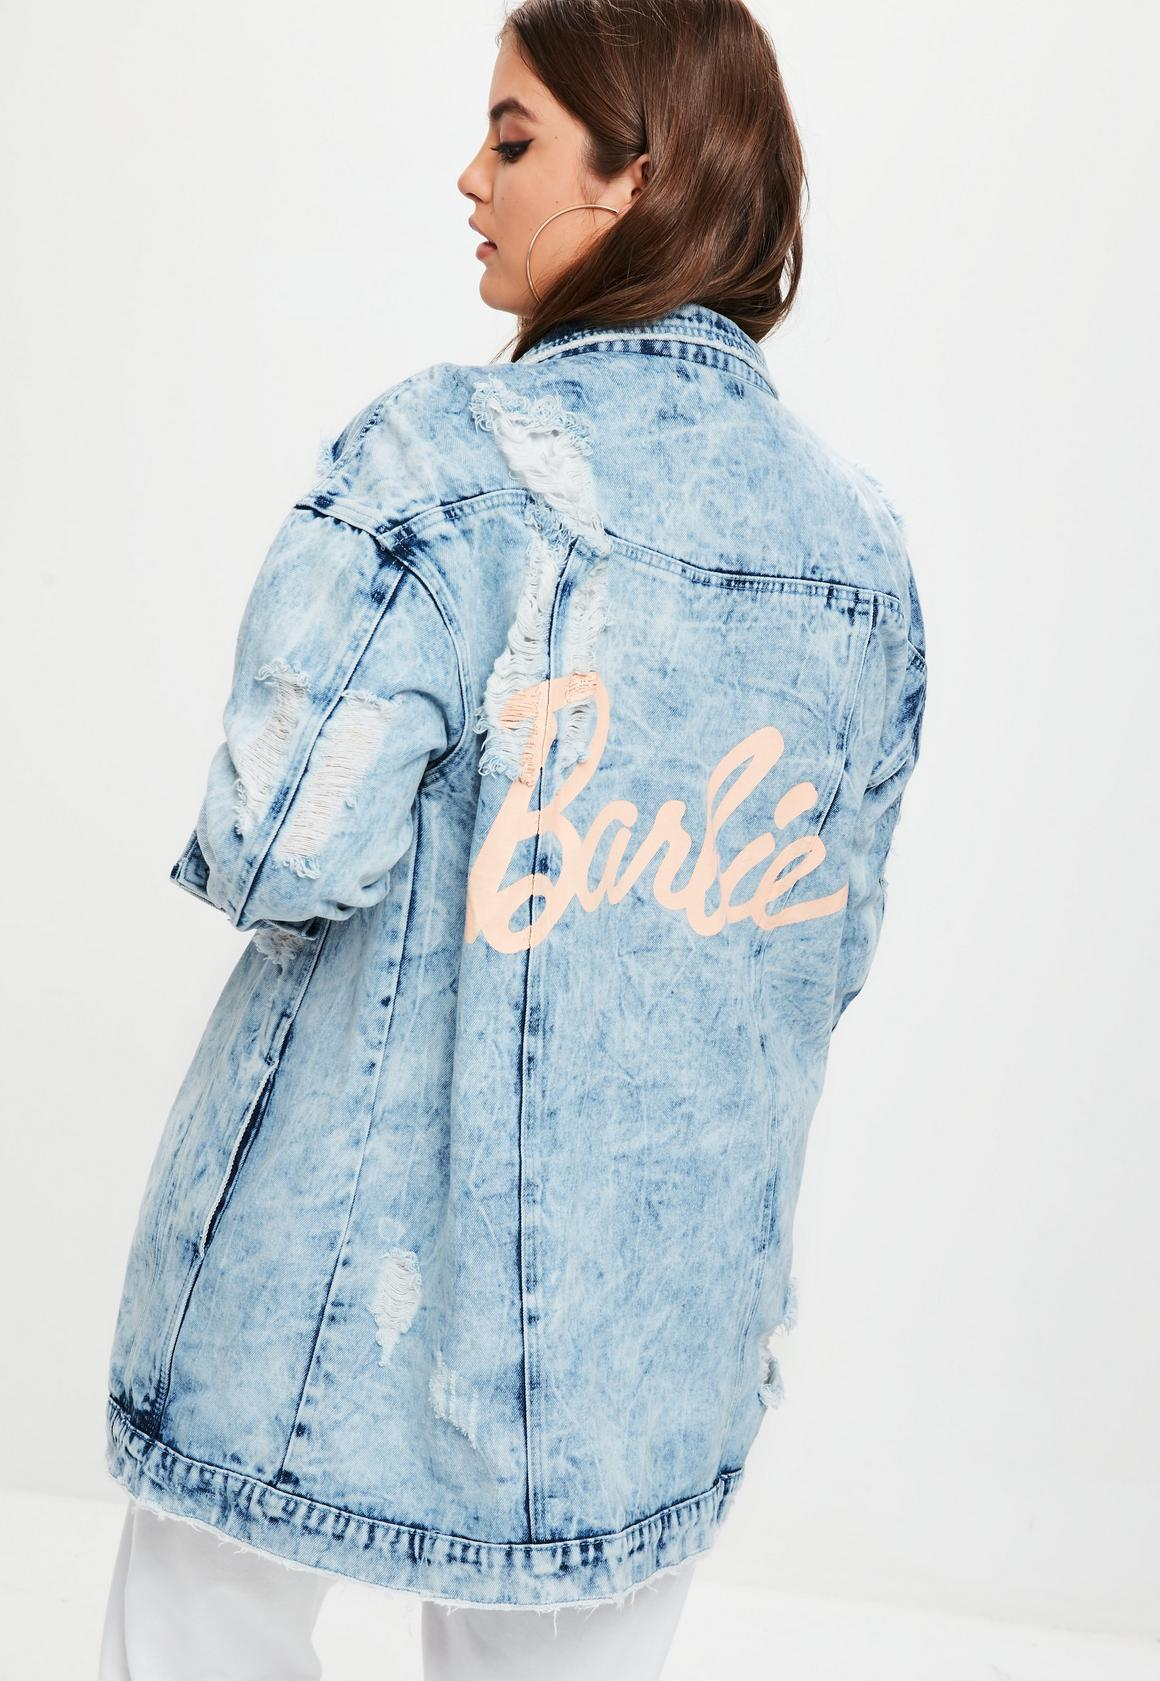 Plus Size Barbie x Missguided Blue Barbie Denim Jacket   Missguided